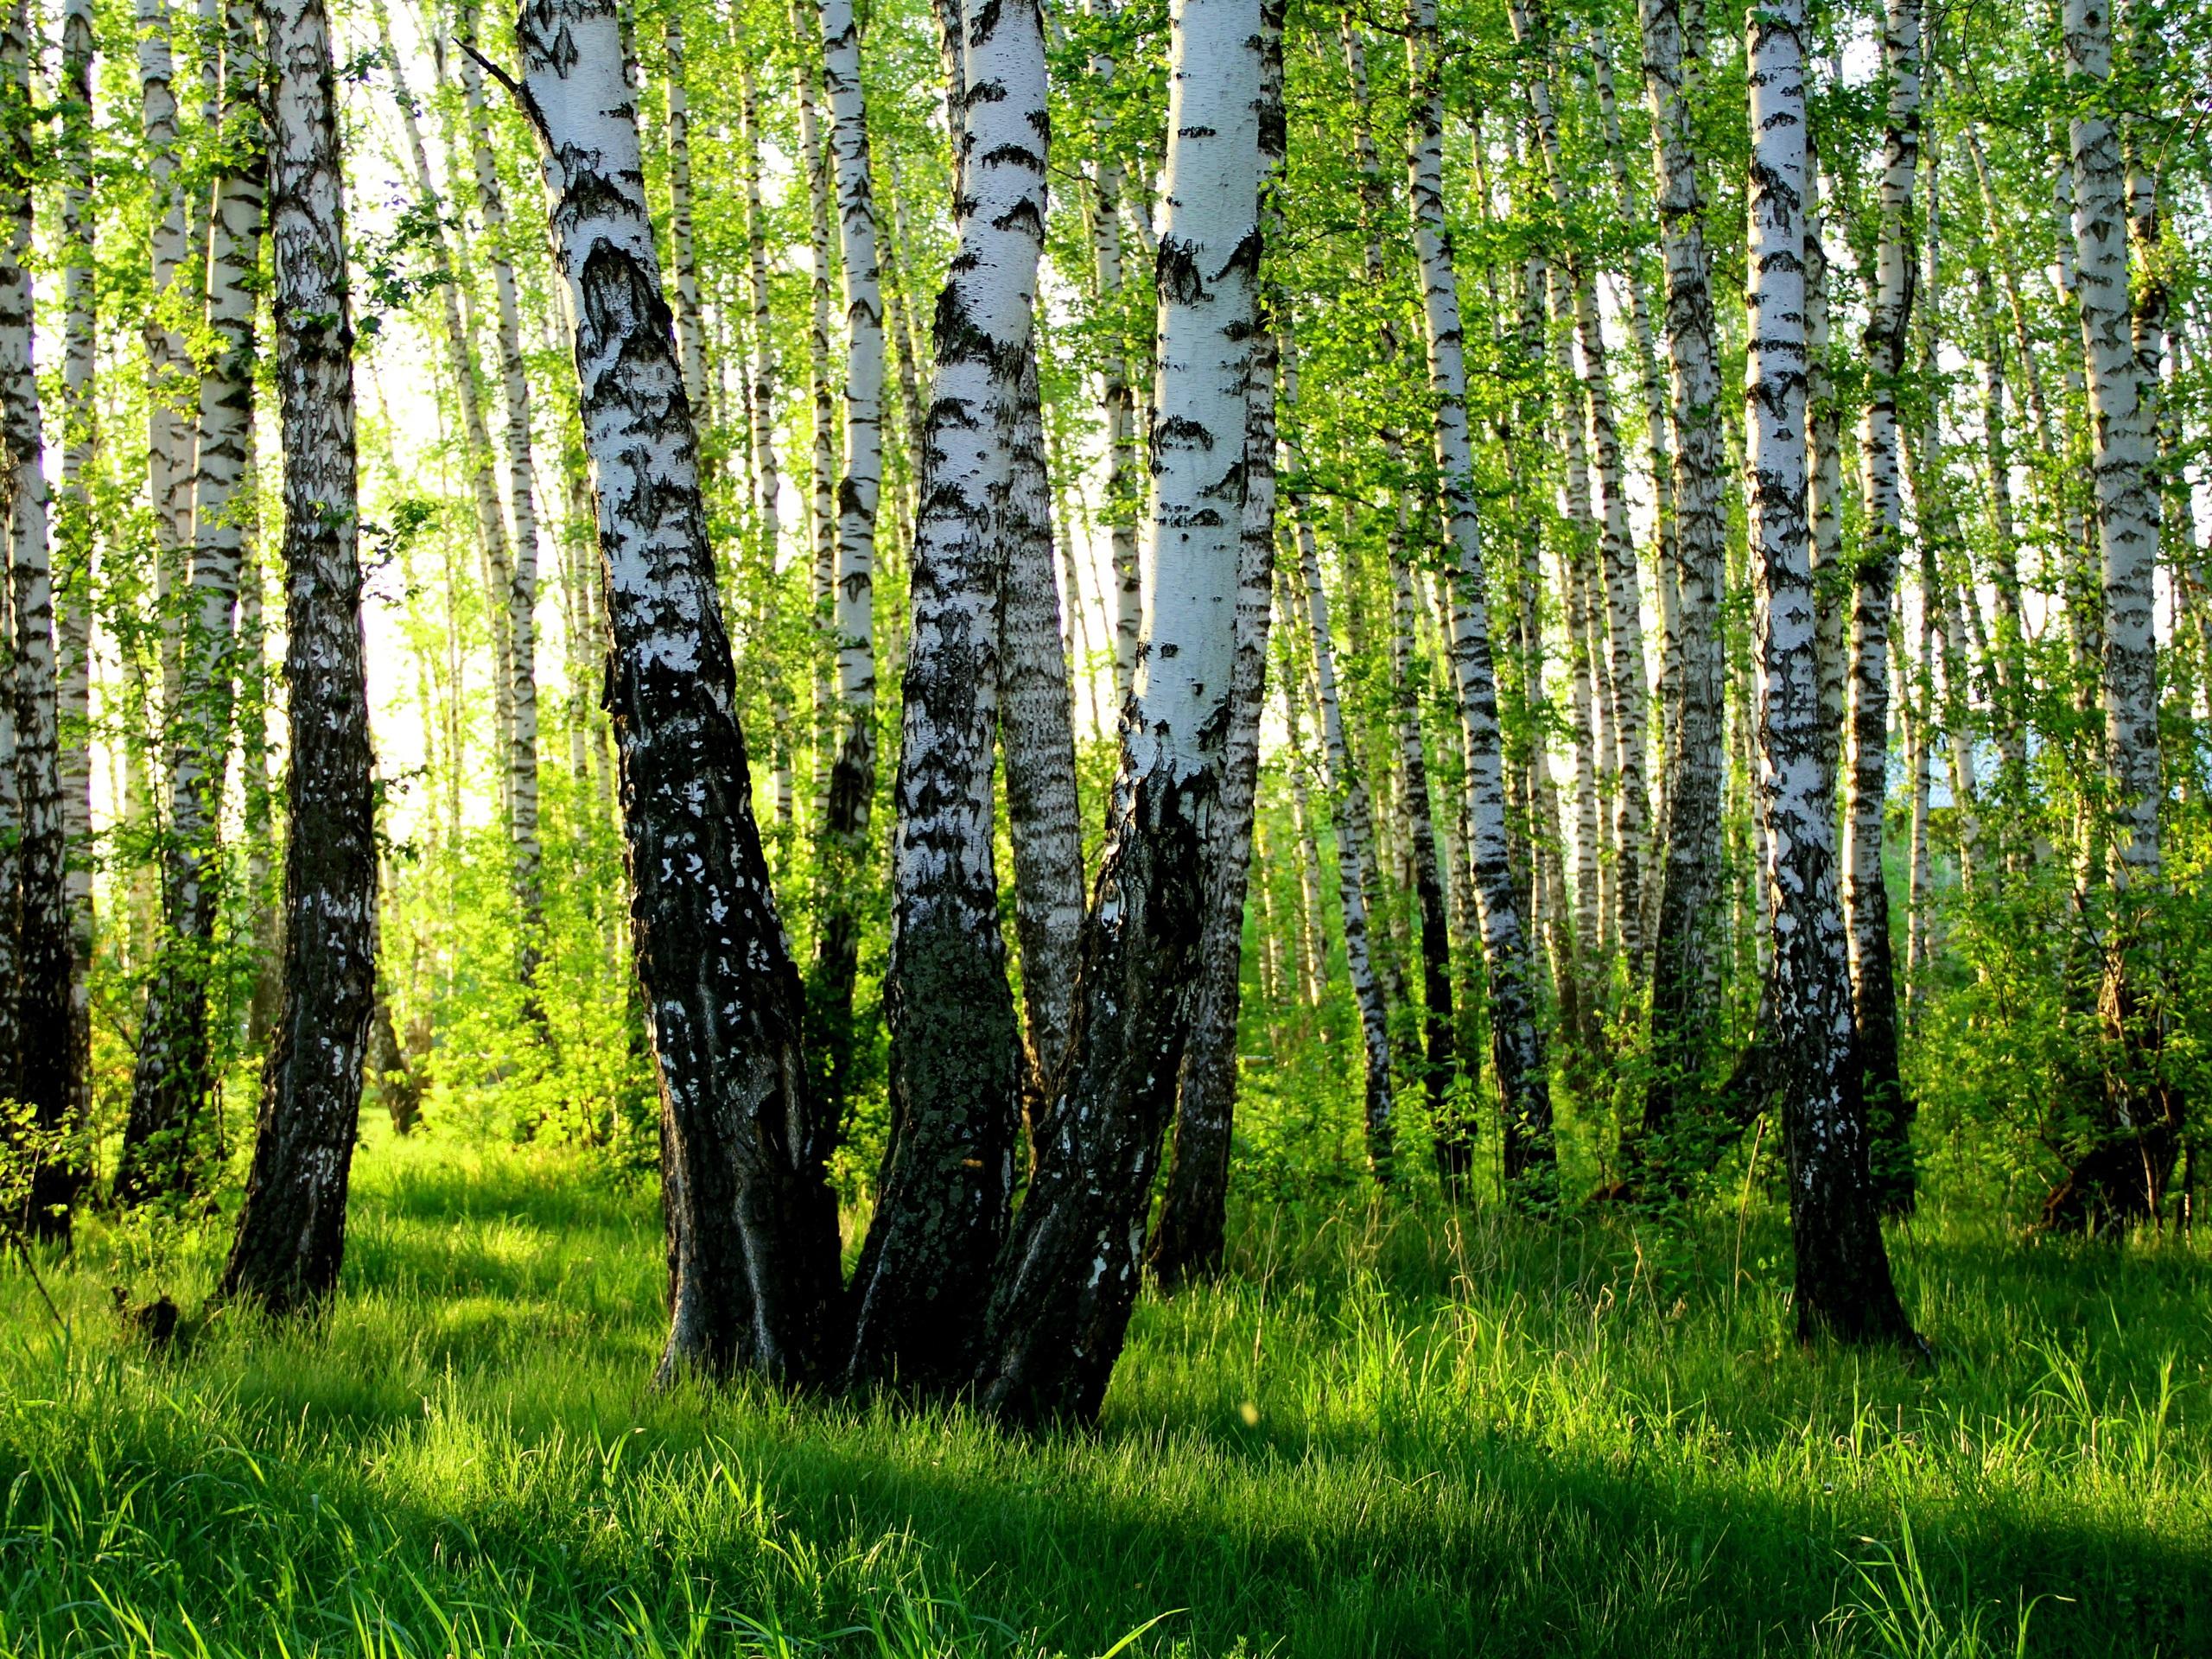 Fondos de pantalla abedul blanco verano bosque 2560x1920 hd imagen - Abedul blanco ...